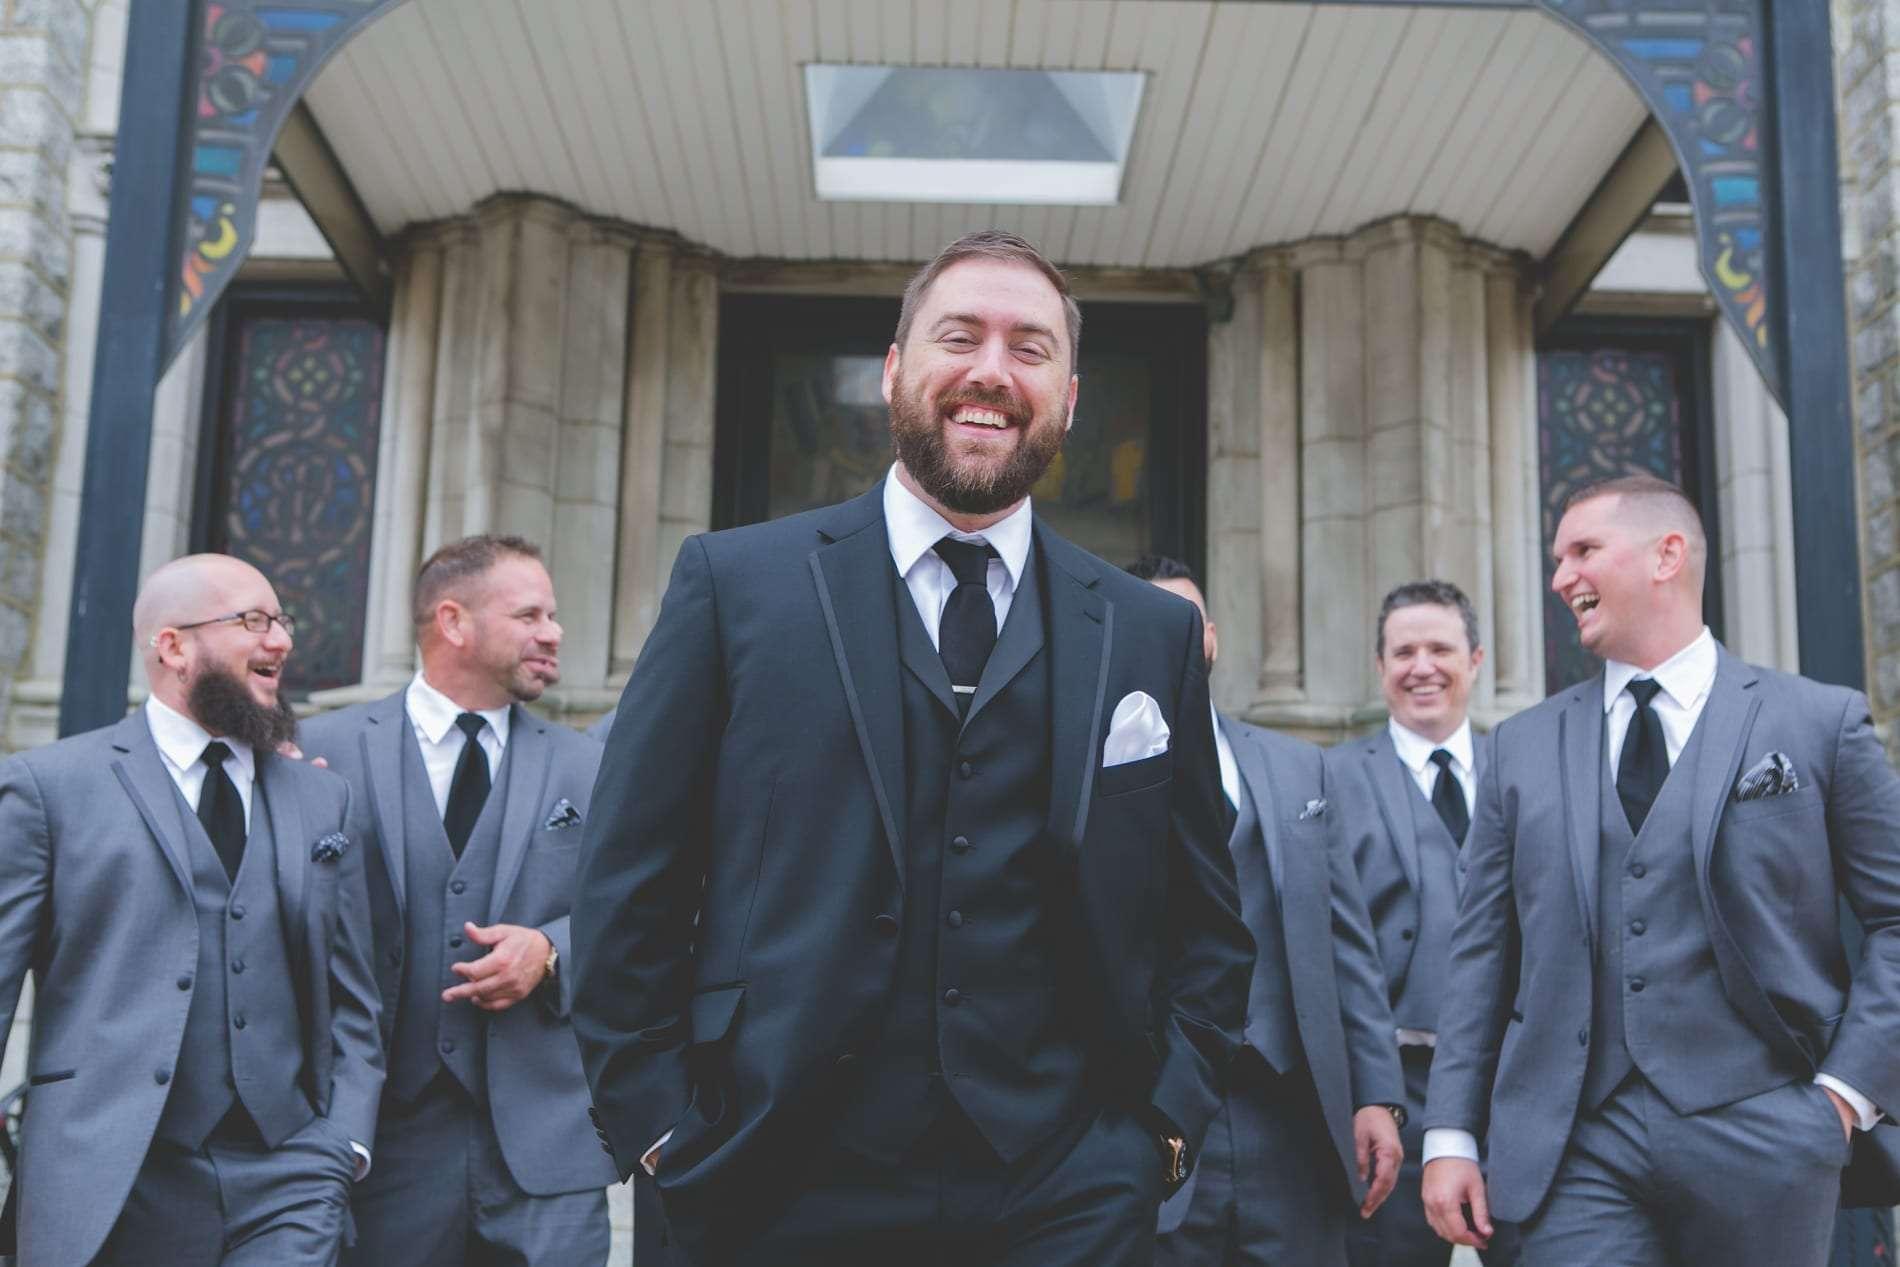 Groom and groomsmen portraits philly wedding photographer